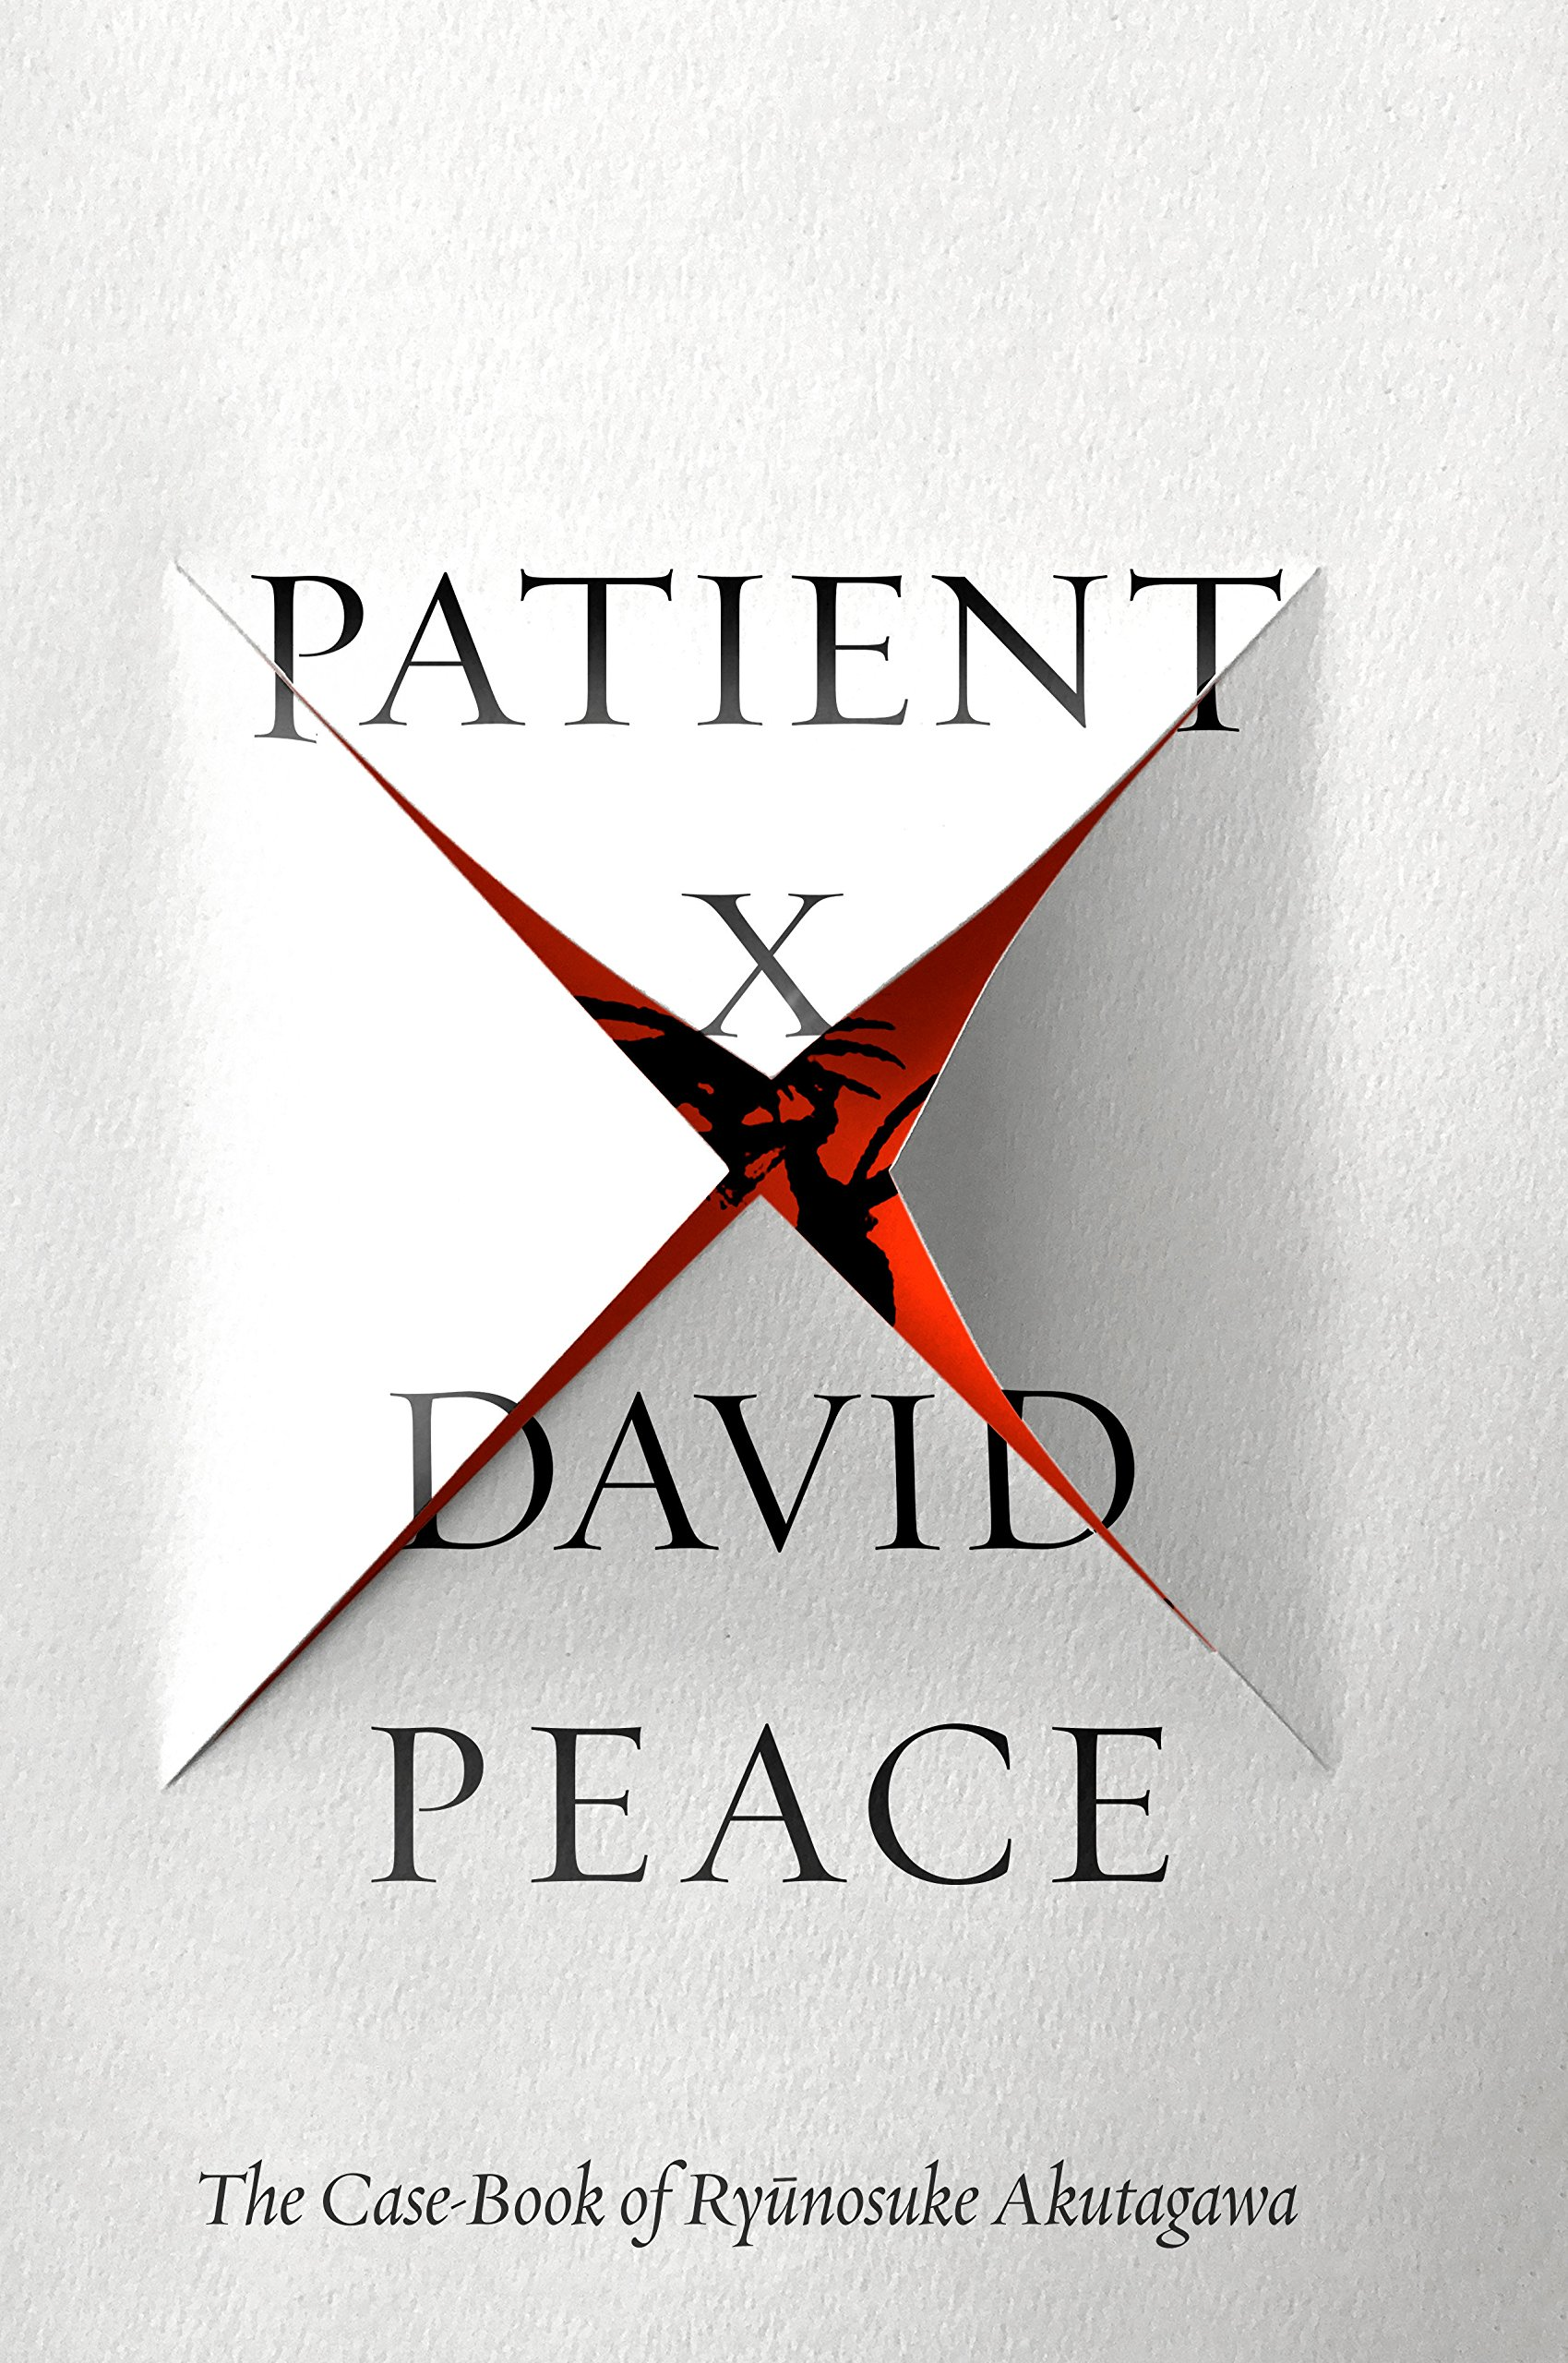 David Peace, <em>Patient X</em>, design by Tyler Comrie (Knopf)